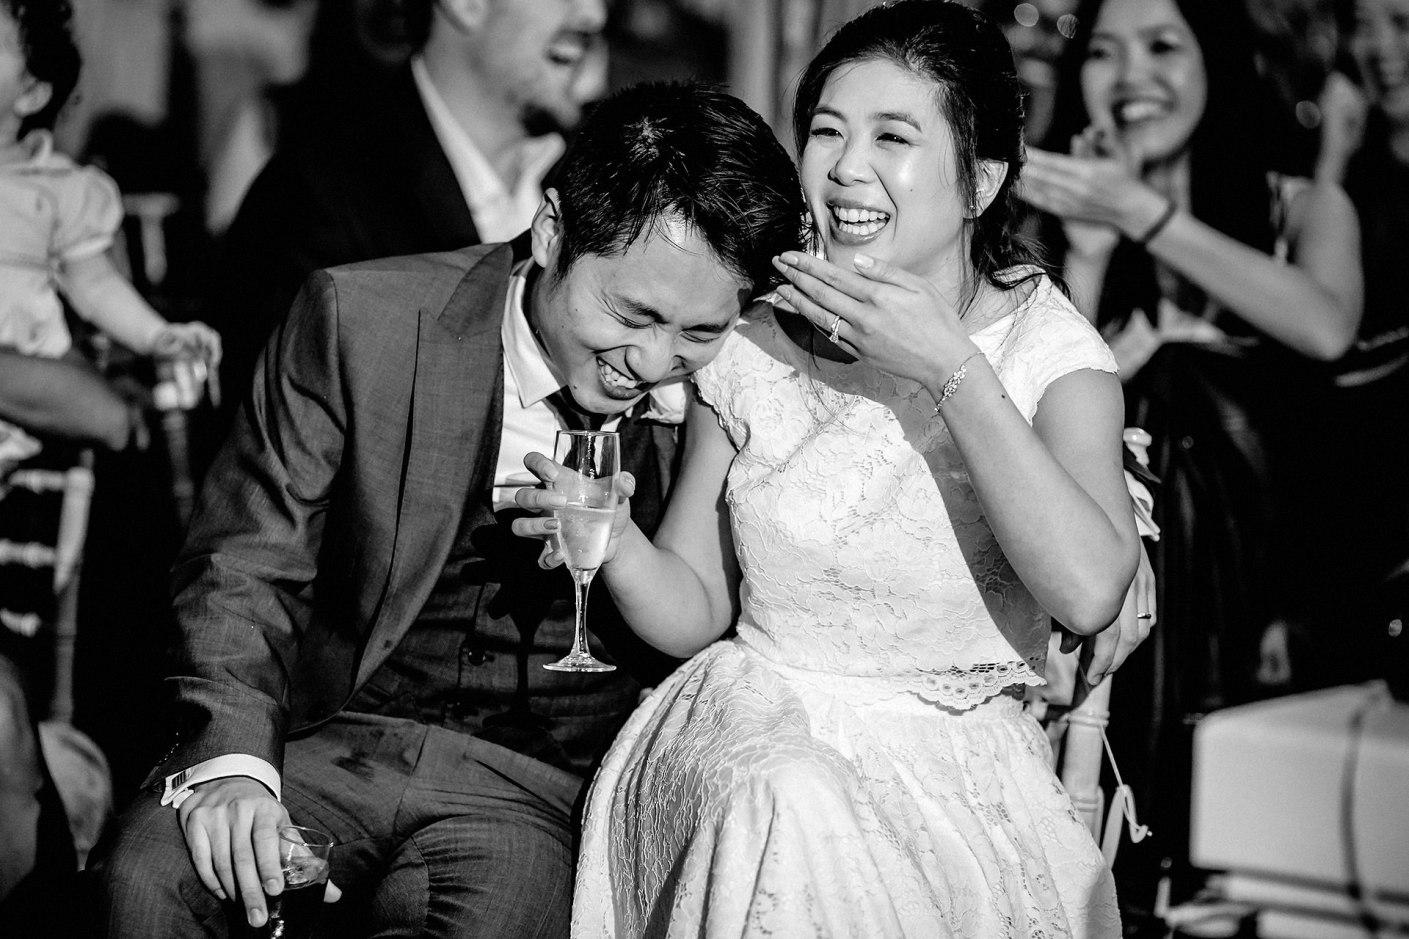 documantary wedding photography style